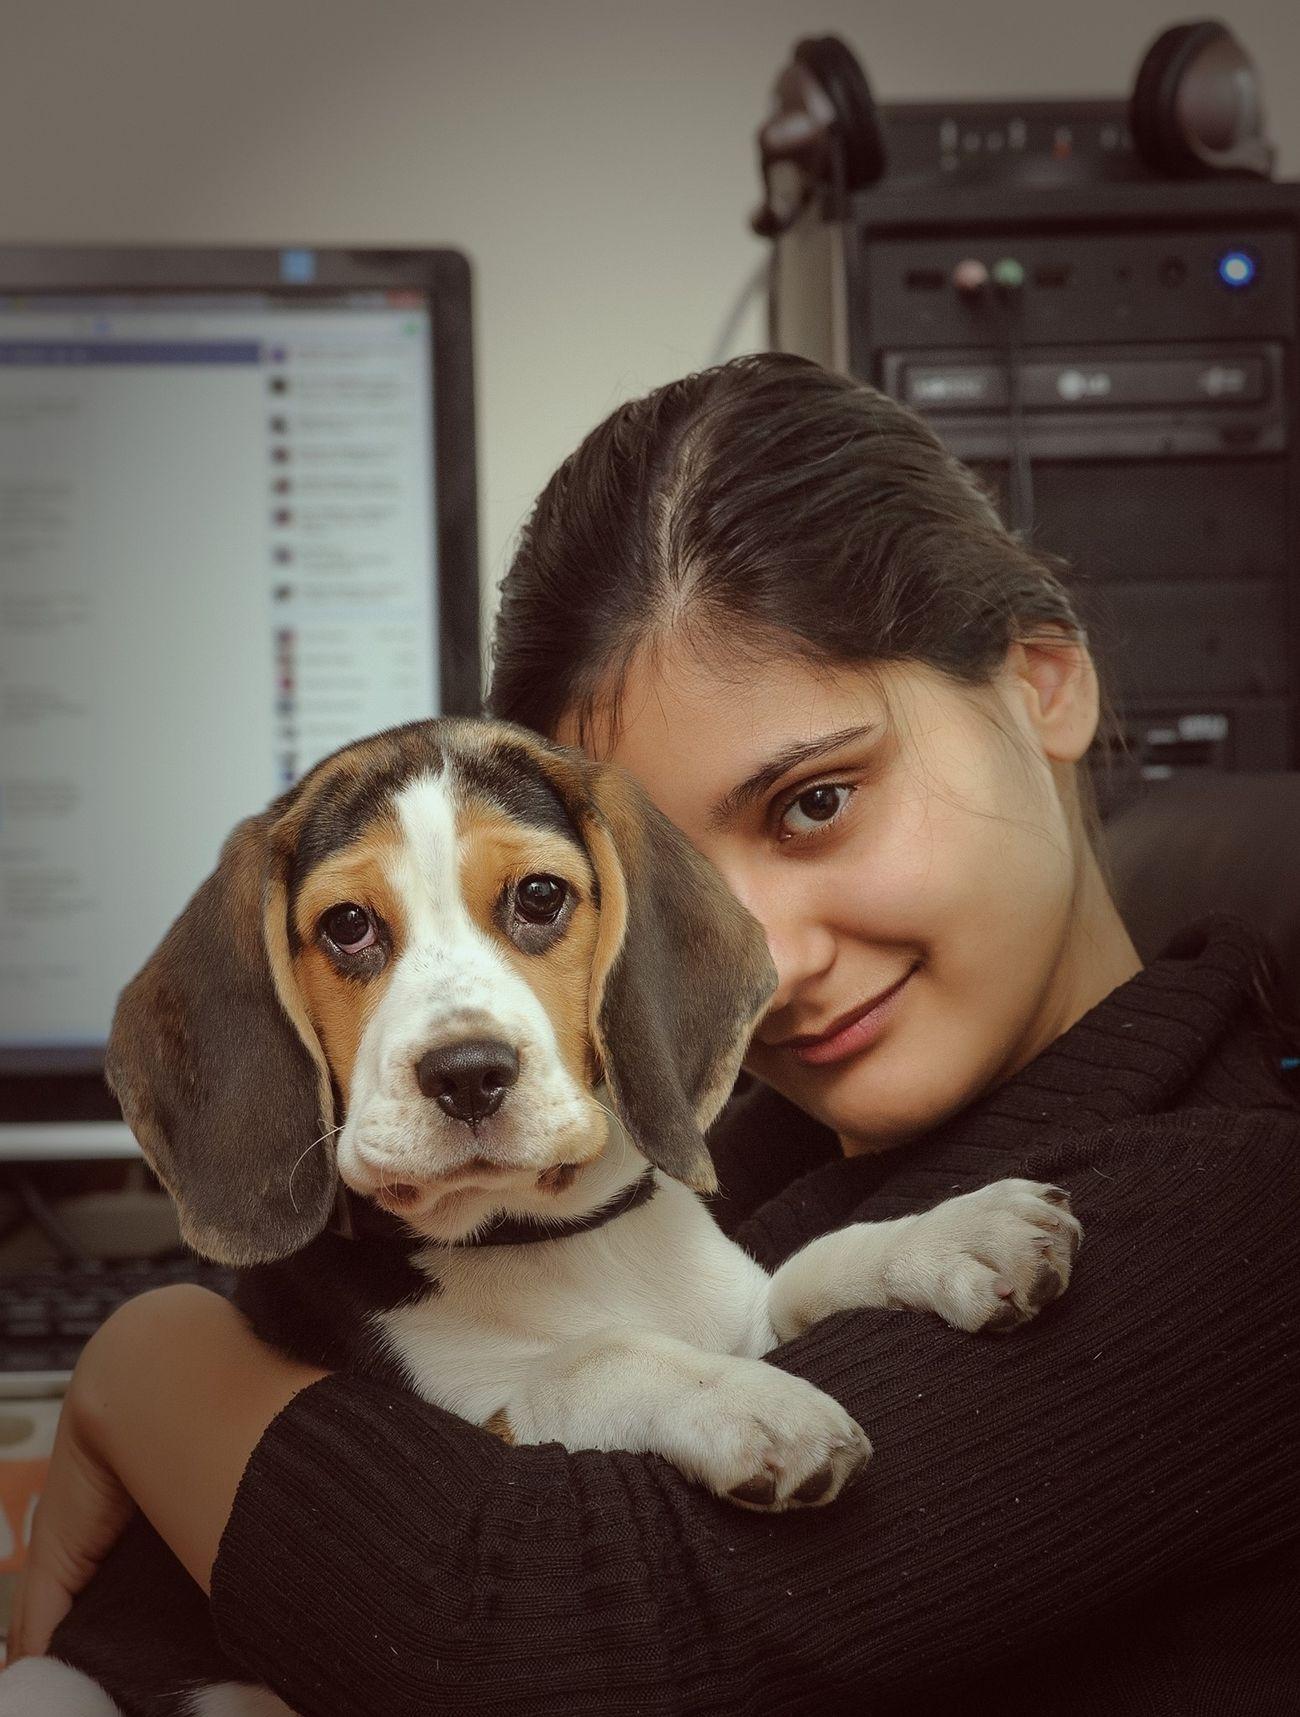 Dog Girlfriend Lovely Portrait